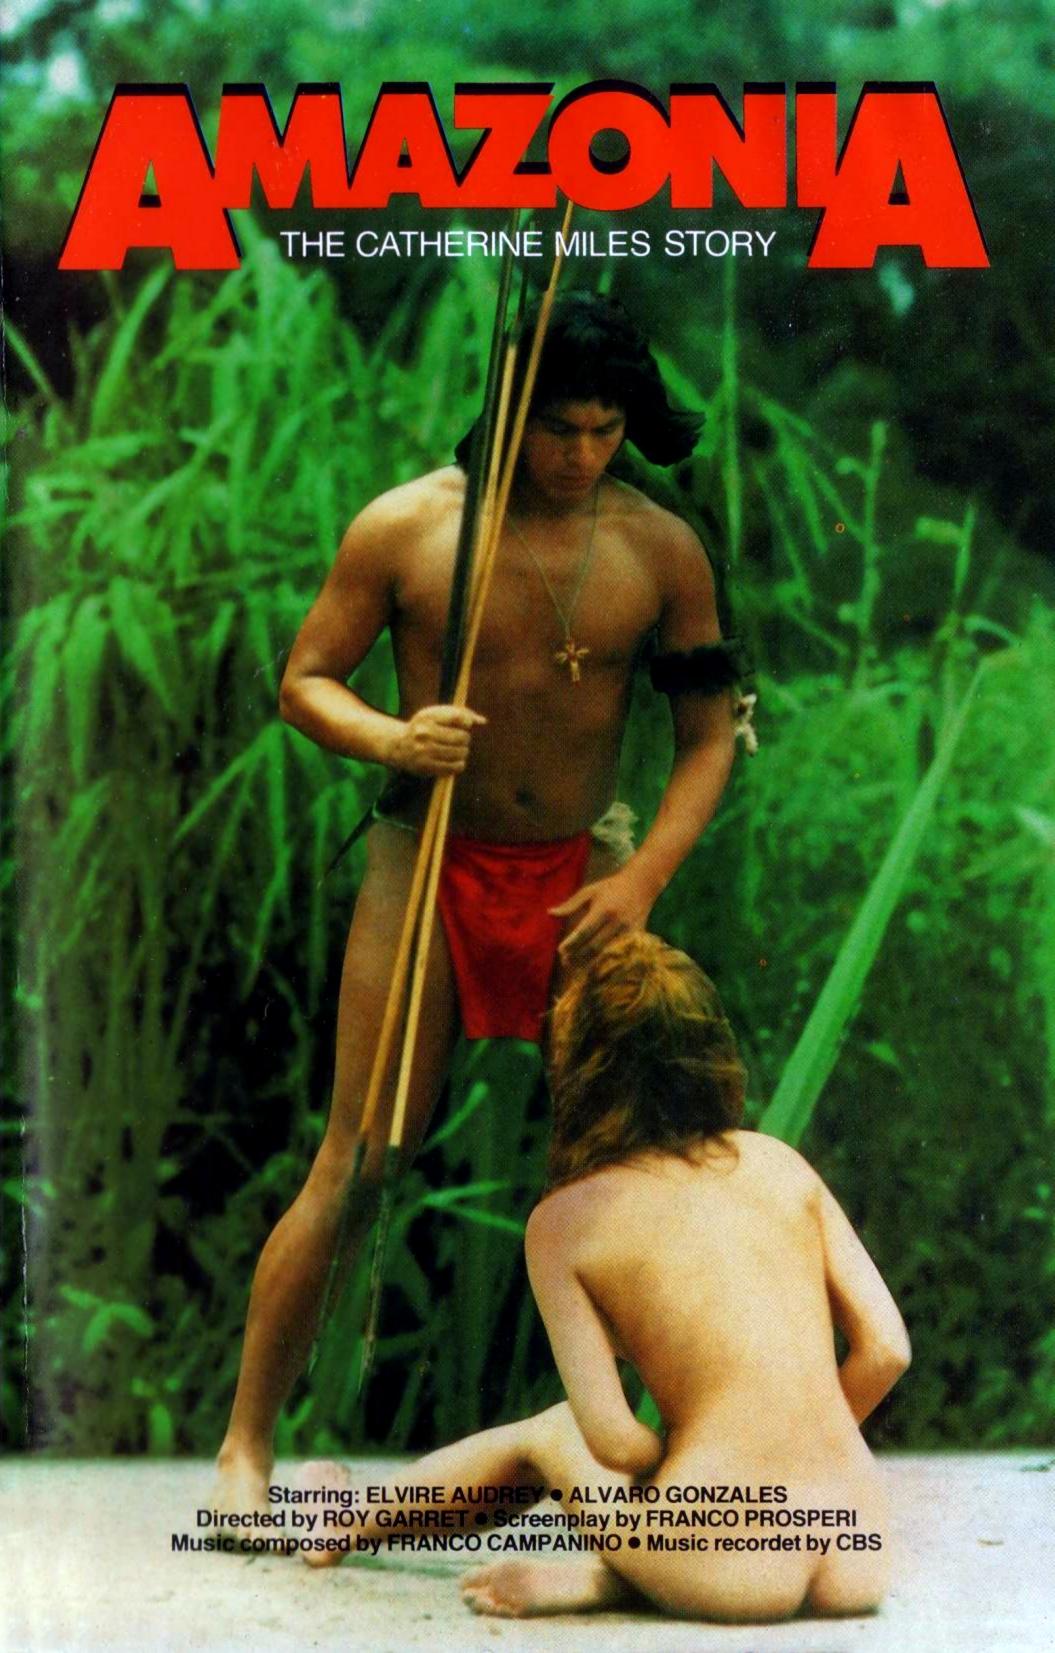 Free sex from amazonia film hardcore scene